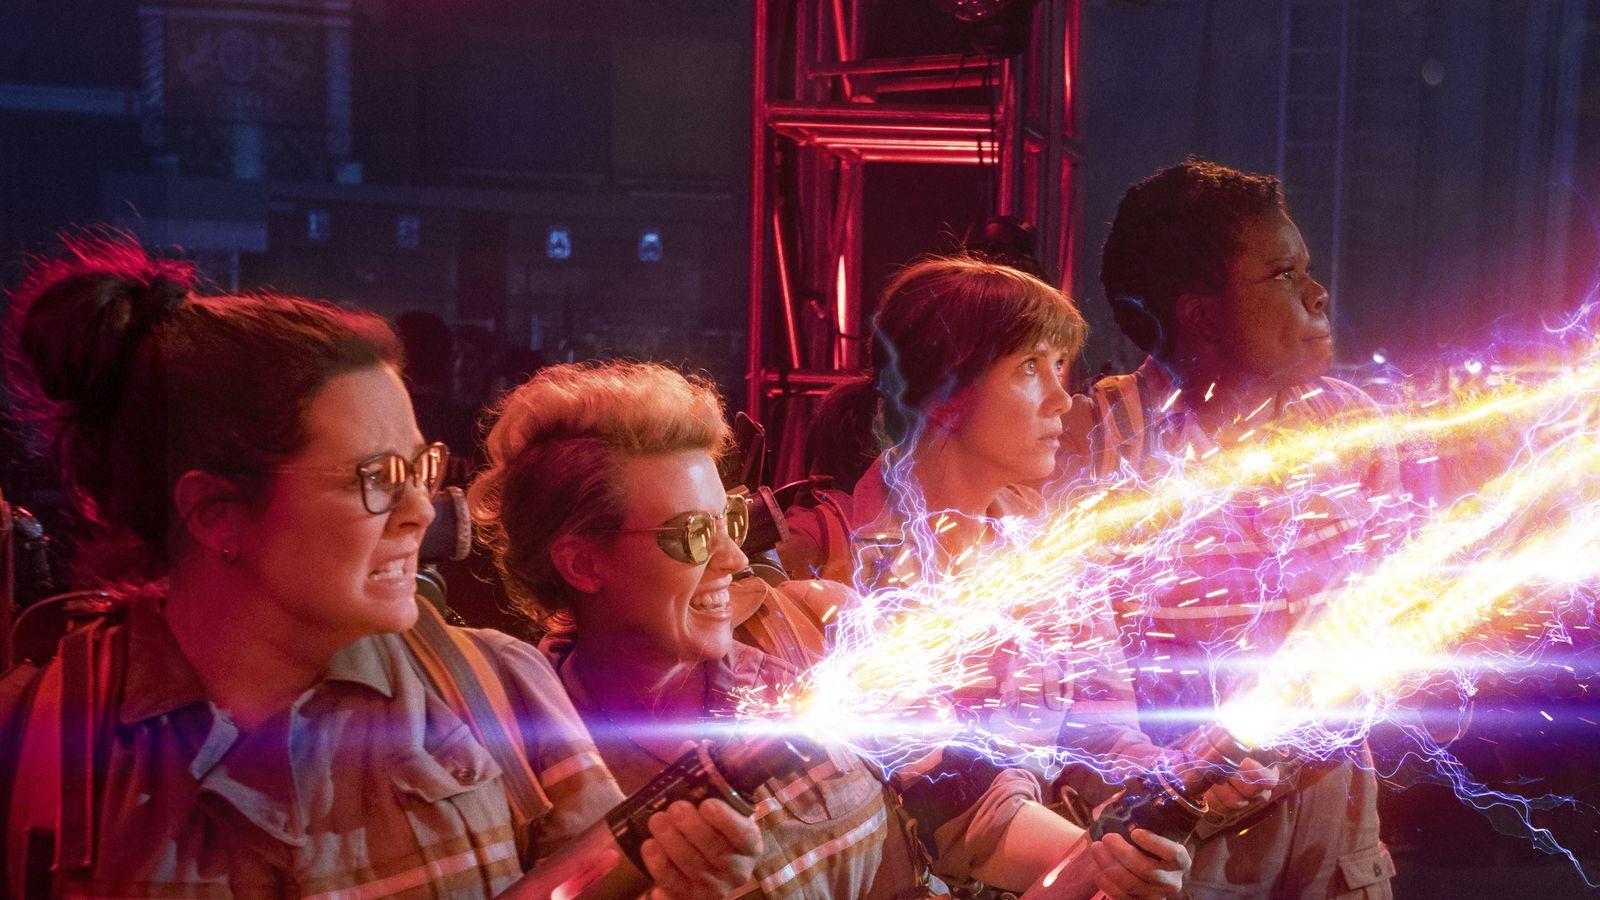 Leslie Jones, Melissa McCarthy, Kate McKinnon, and Kristen Wiig in Ghostbusters (2016)